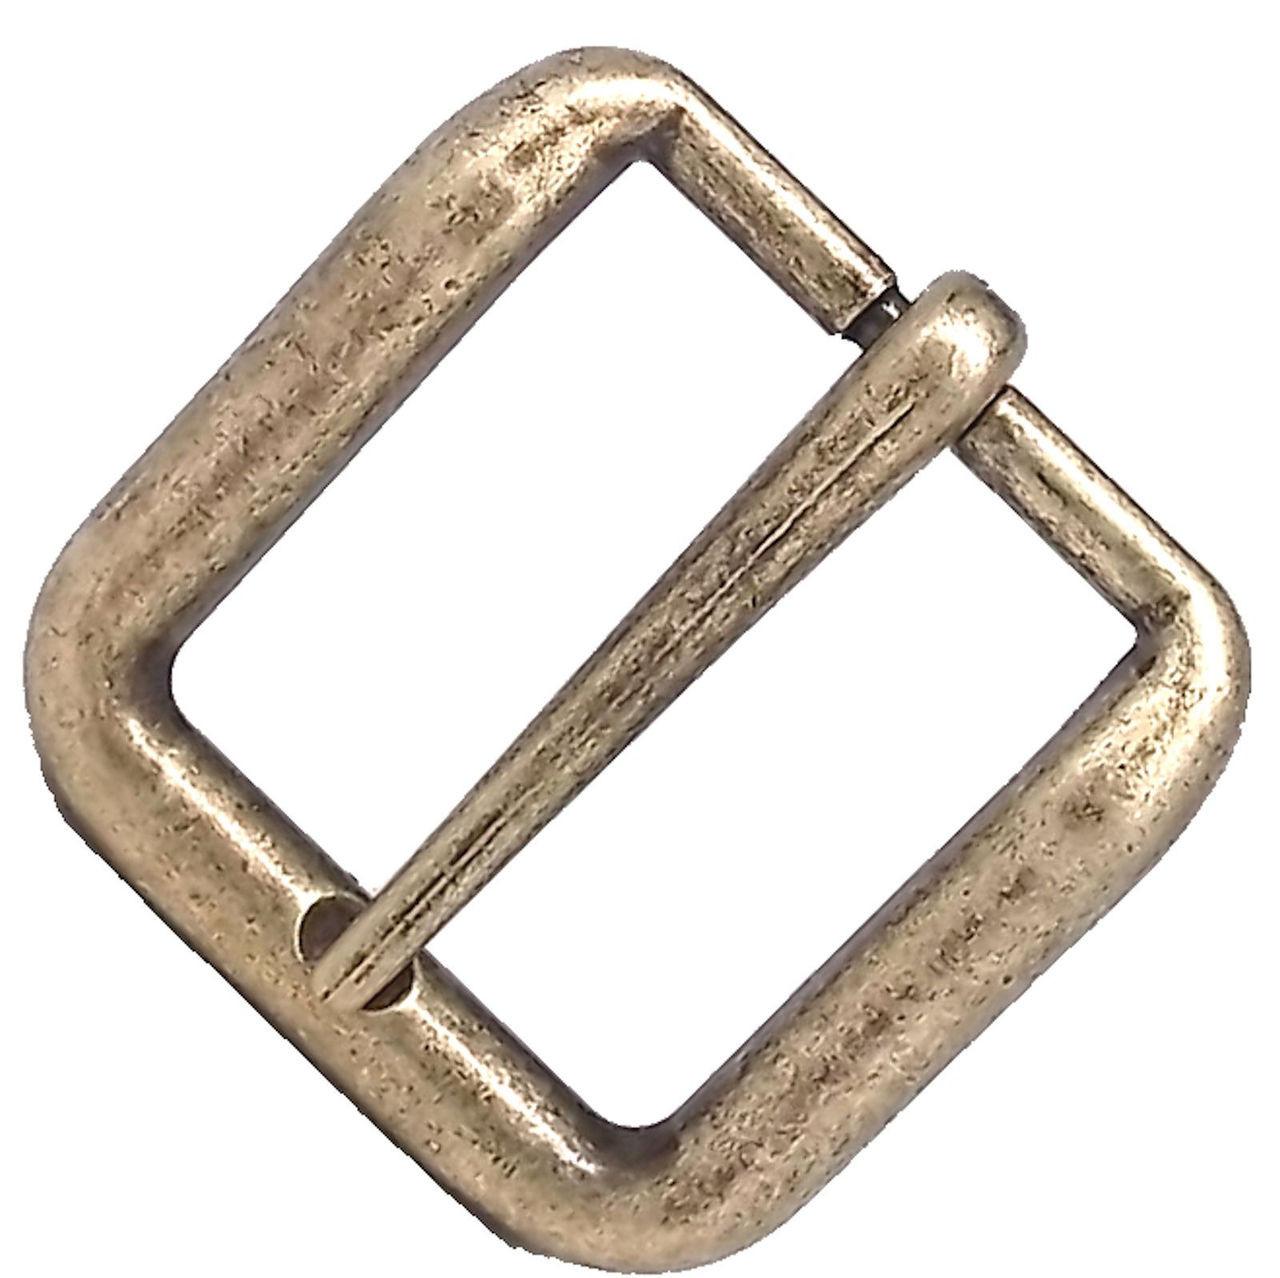 "Wave Buckle 1-1//4/"" Solid Antique Brass 1640-09 by Stecksstore"